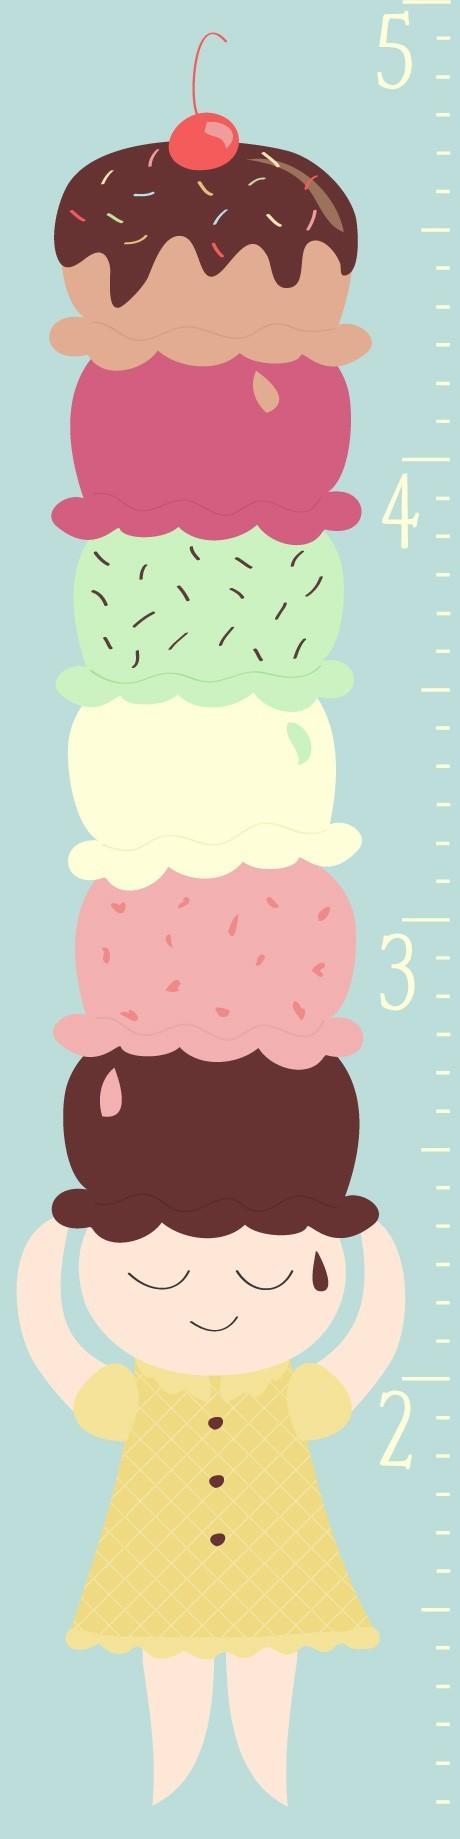 Ice Cream Growth Chart 5000 Via Etsy Walls Not Bare